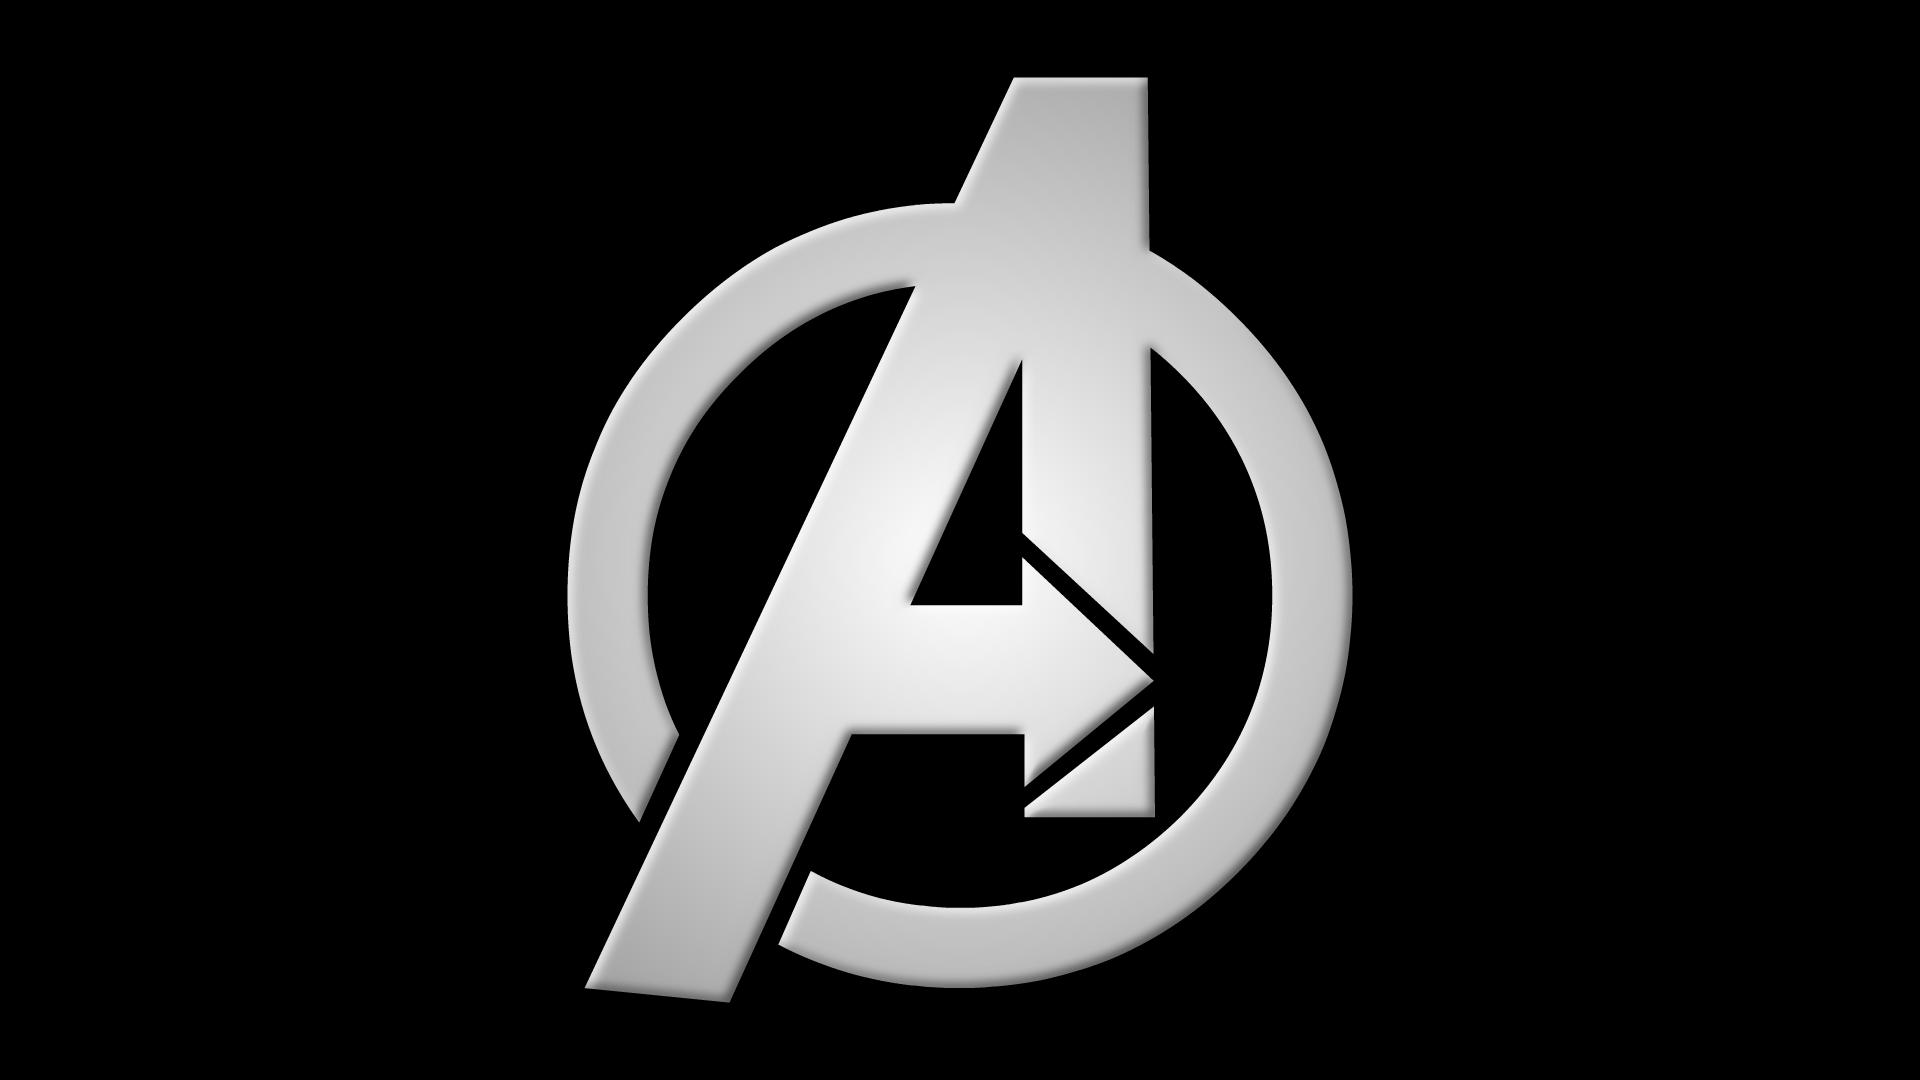 avenger symbol google search avenger symbol google search